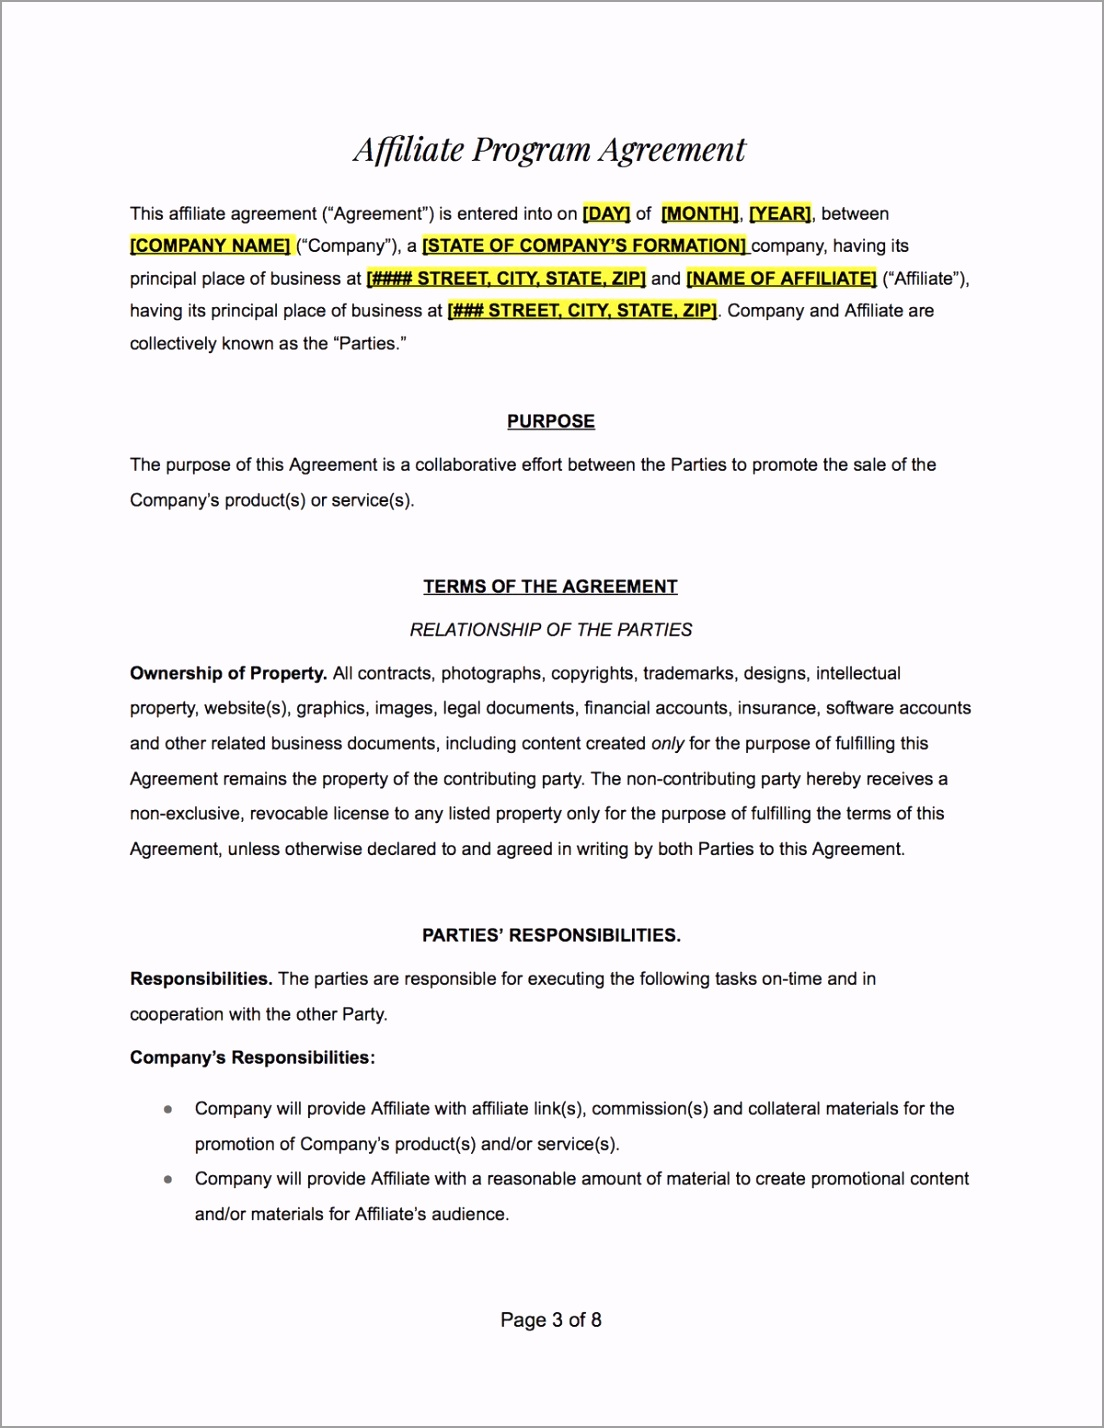 Affiliate Program Contract Docs 1200x eoper